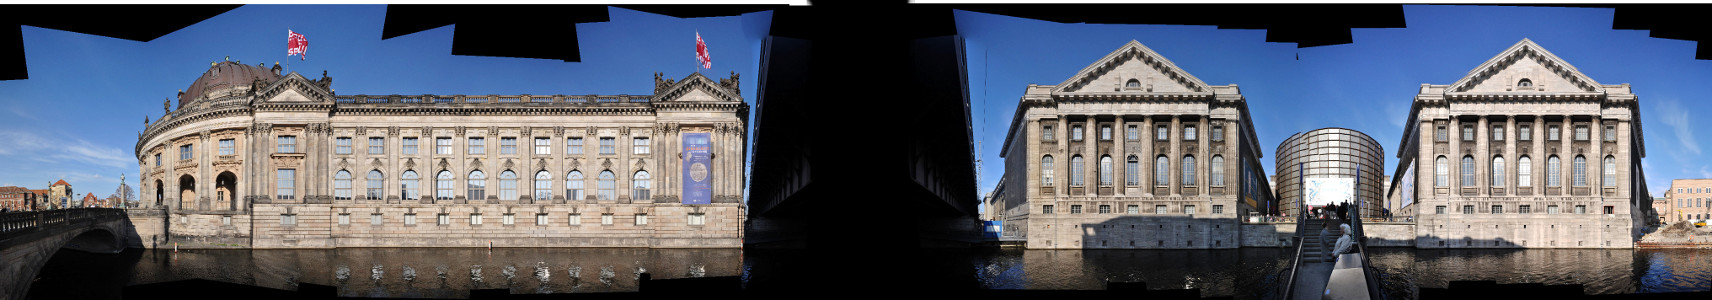 Berlin Museumsinsel Strassenpanorama an der Spree